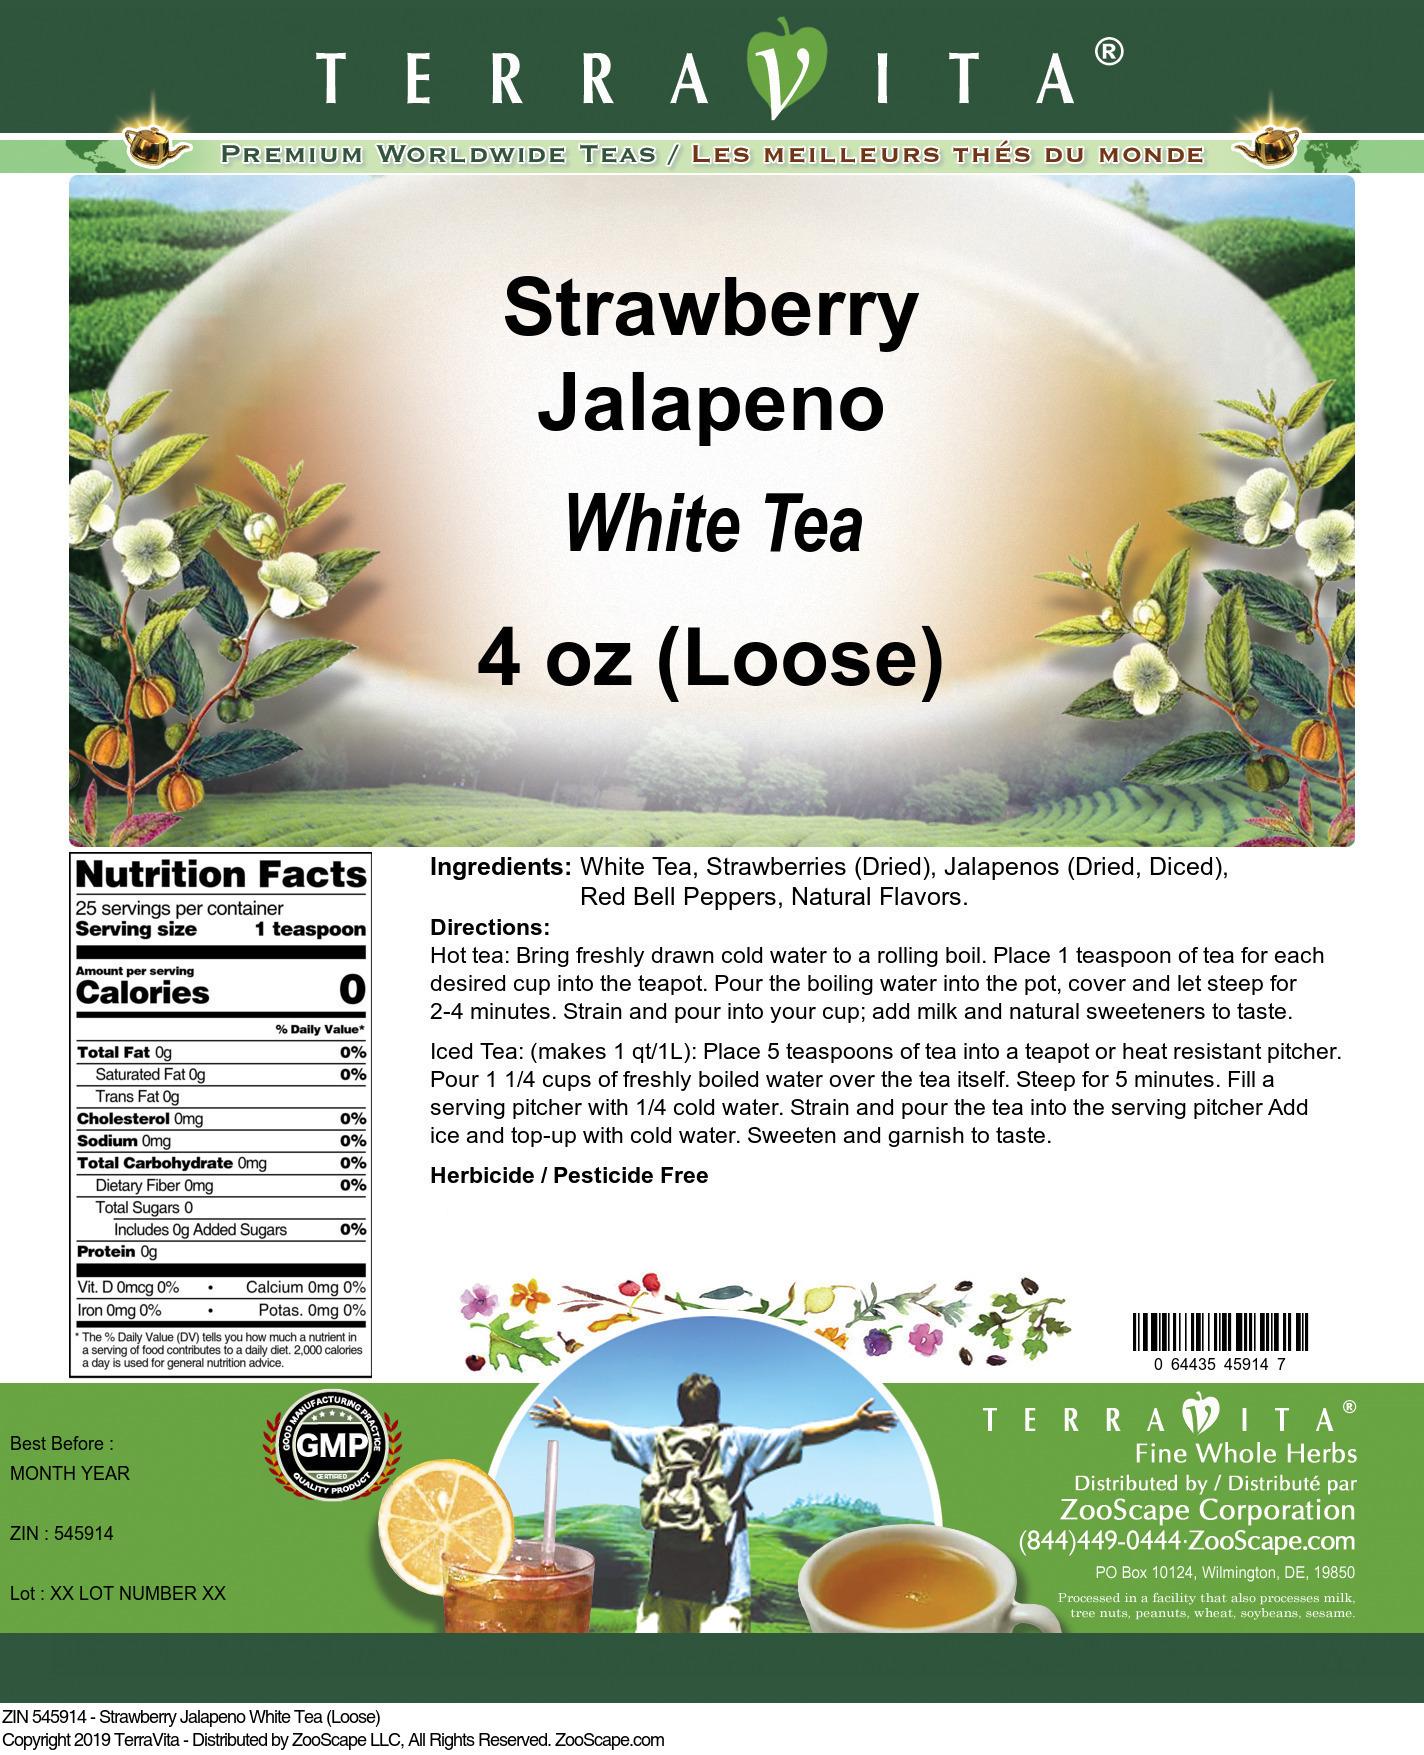 Strawberry Jalapeno White Tea (Loose)